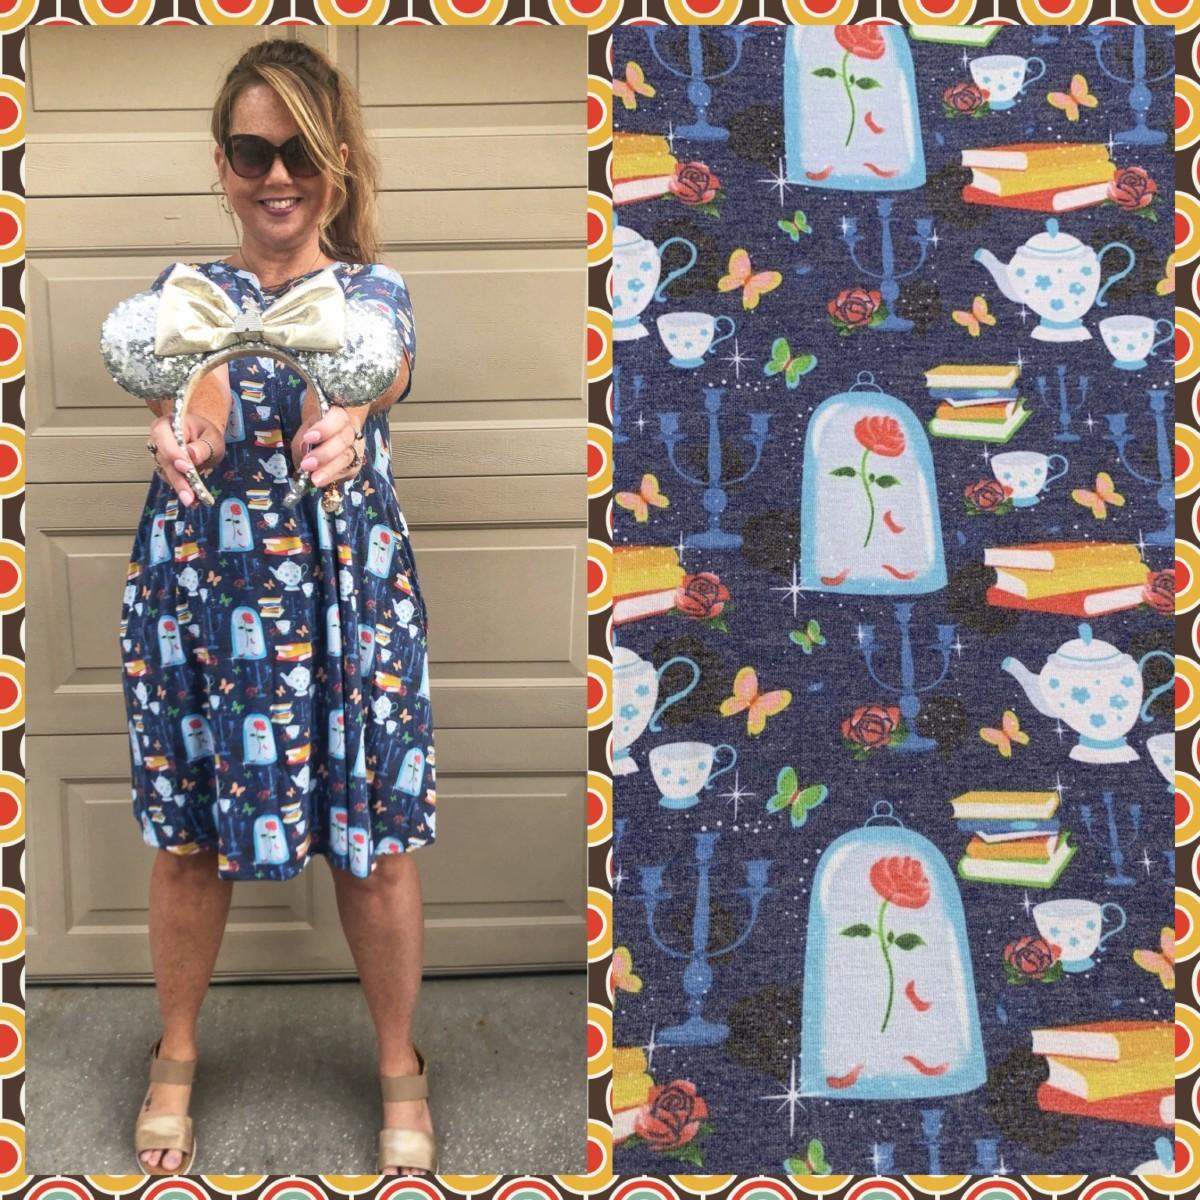 NEW Disney Style! Magically Themed Dresses & Leggings! 2